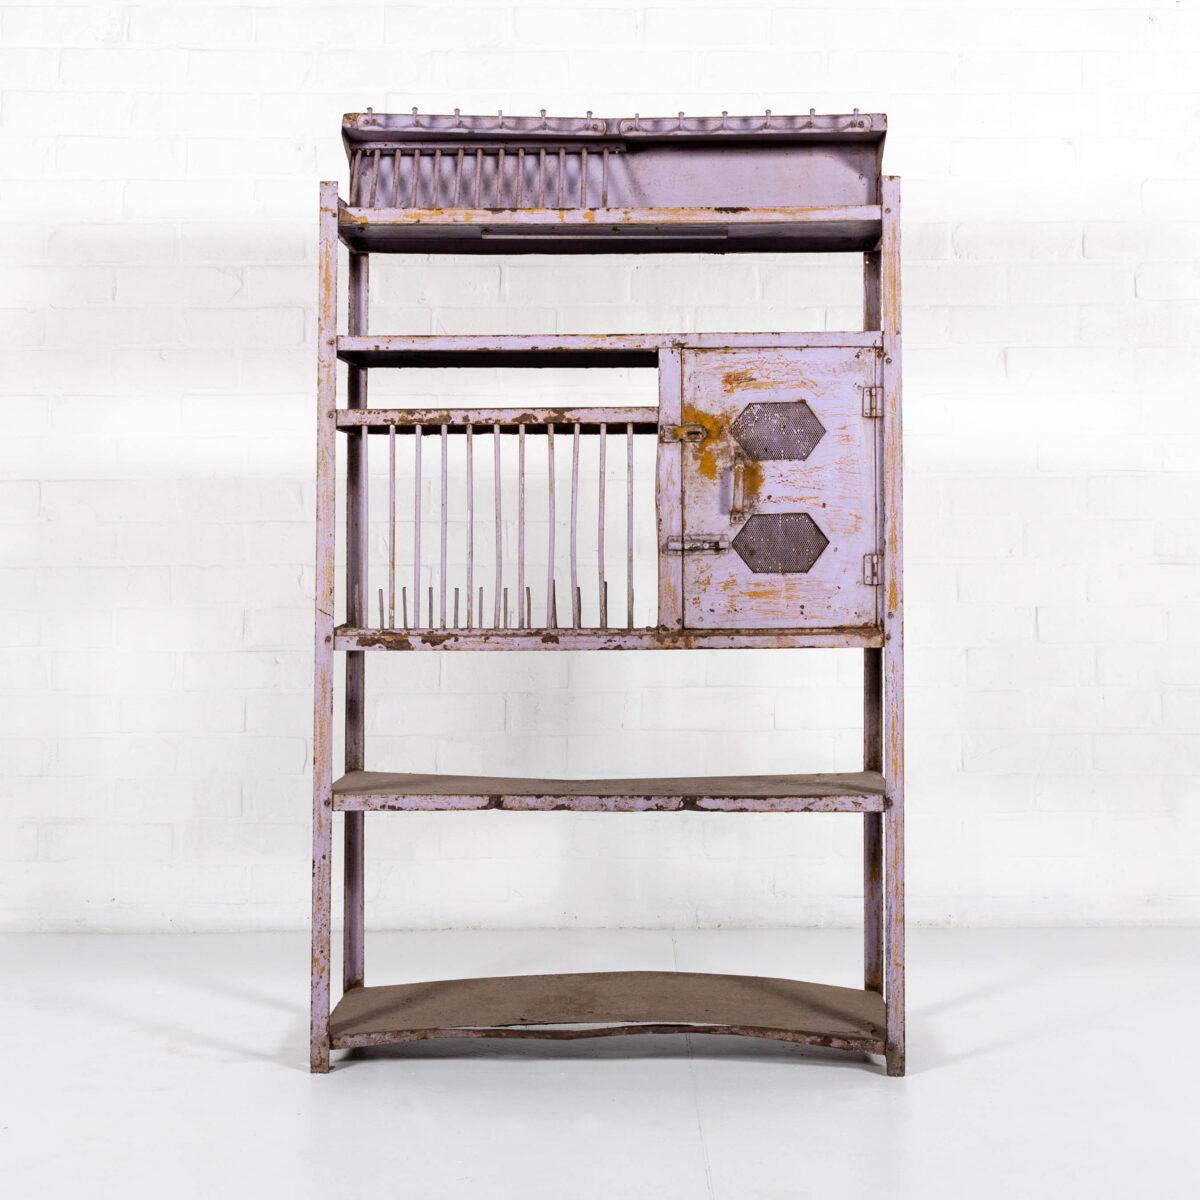 Old-India-kitchen-rack-purple-pink-1